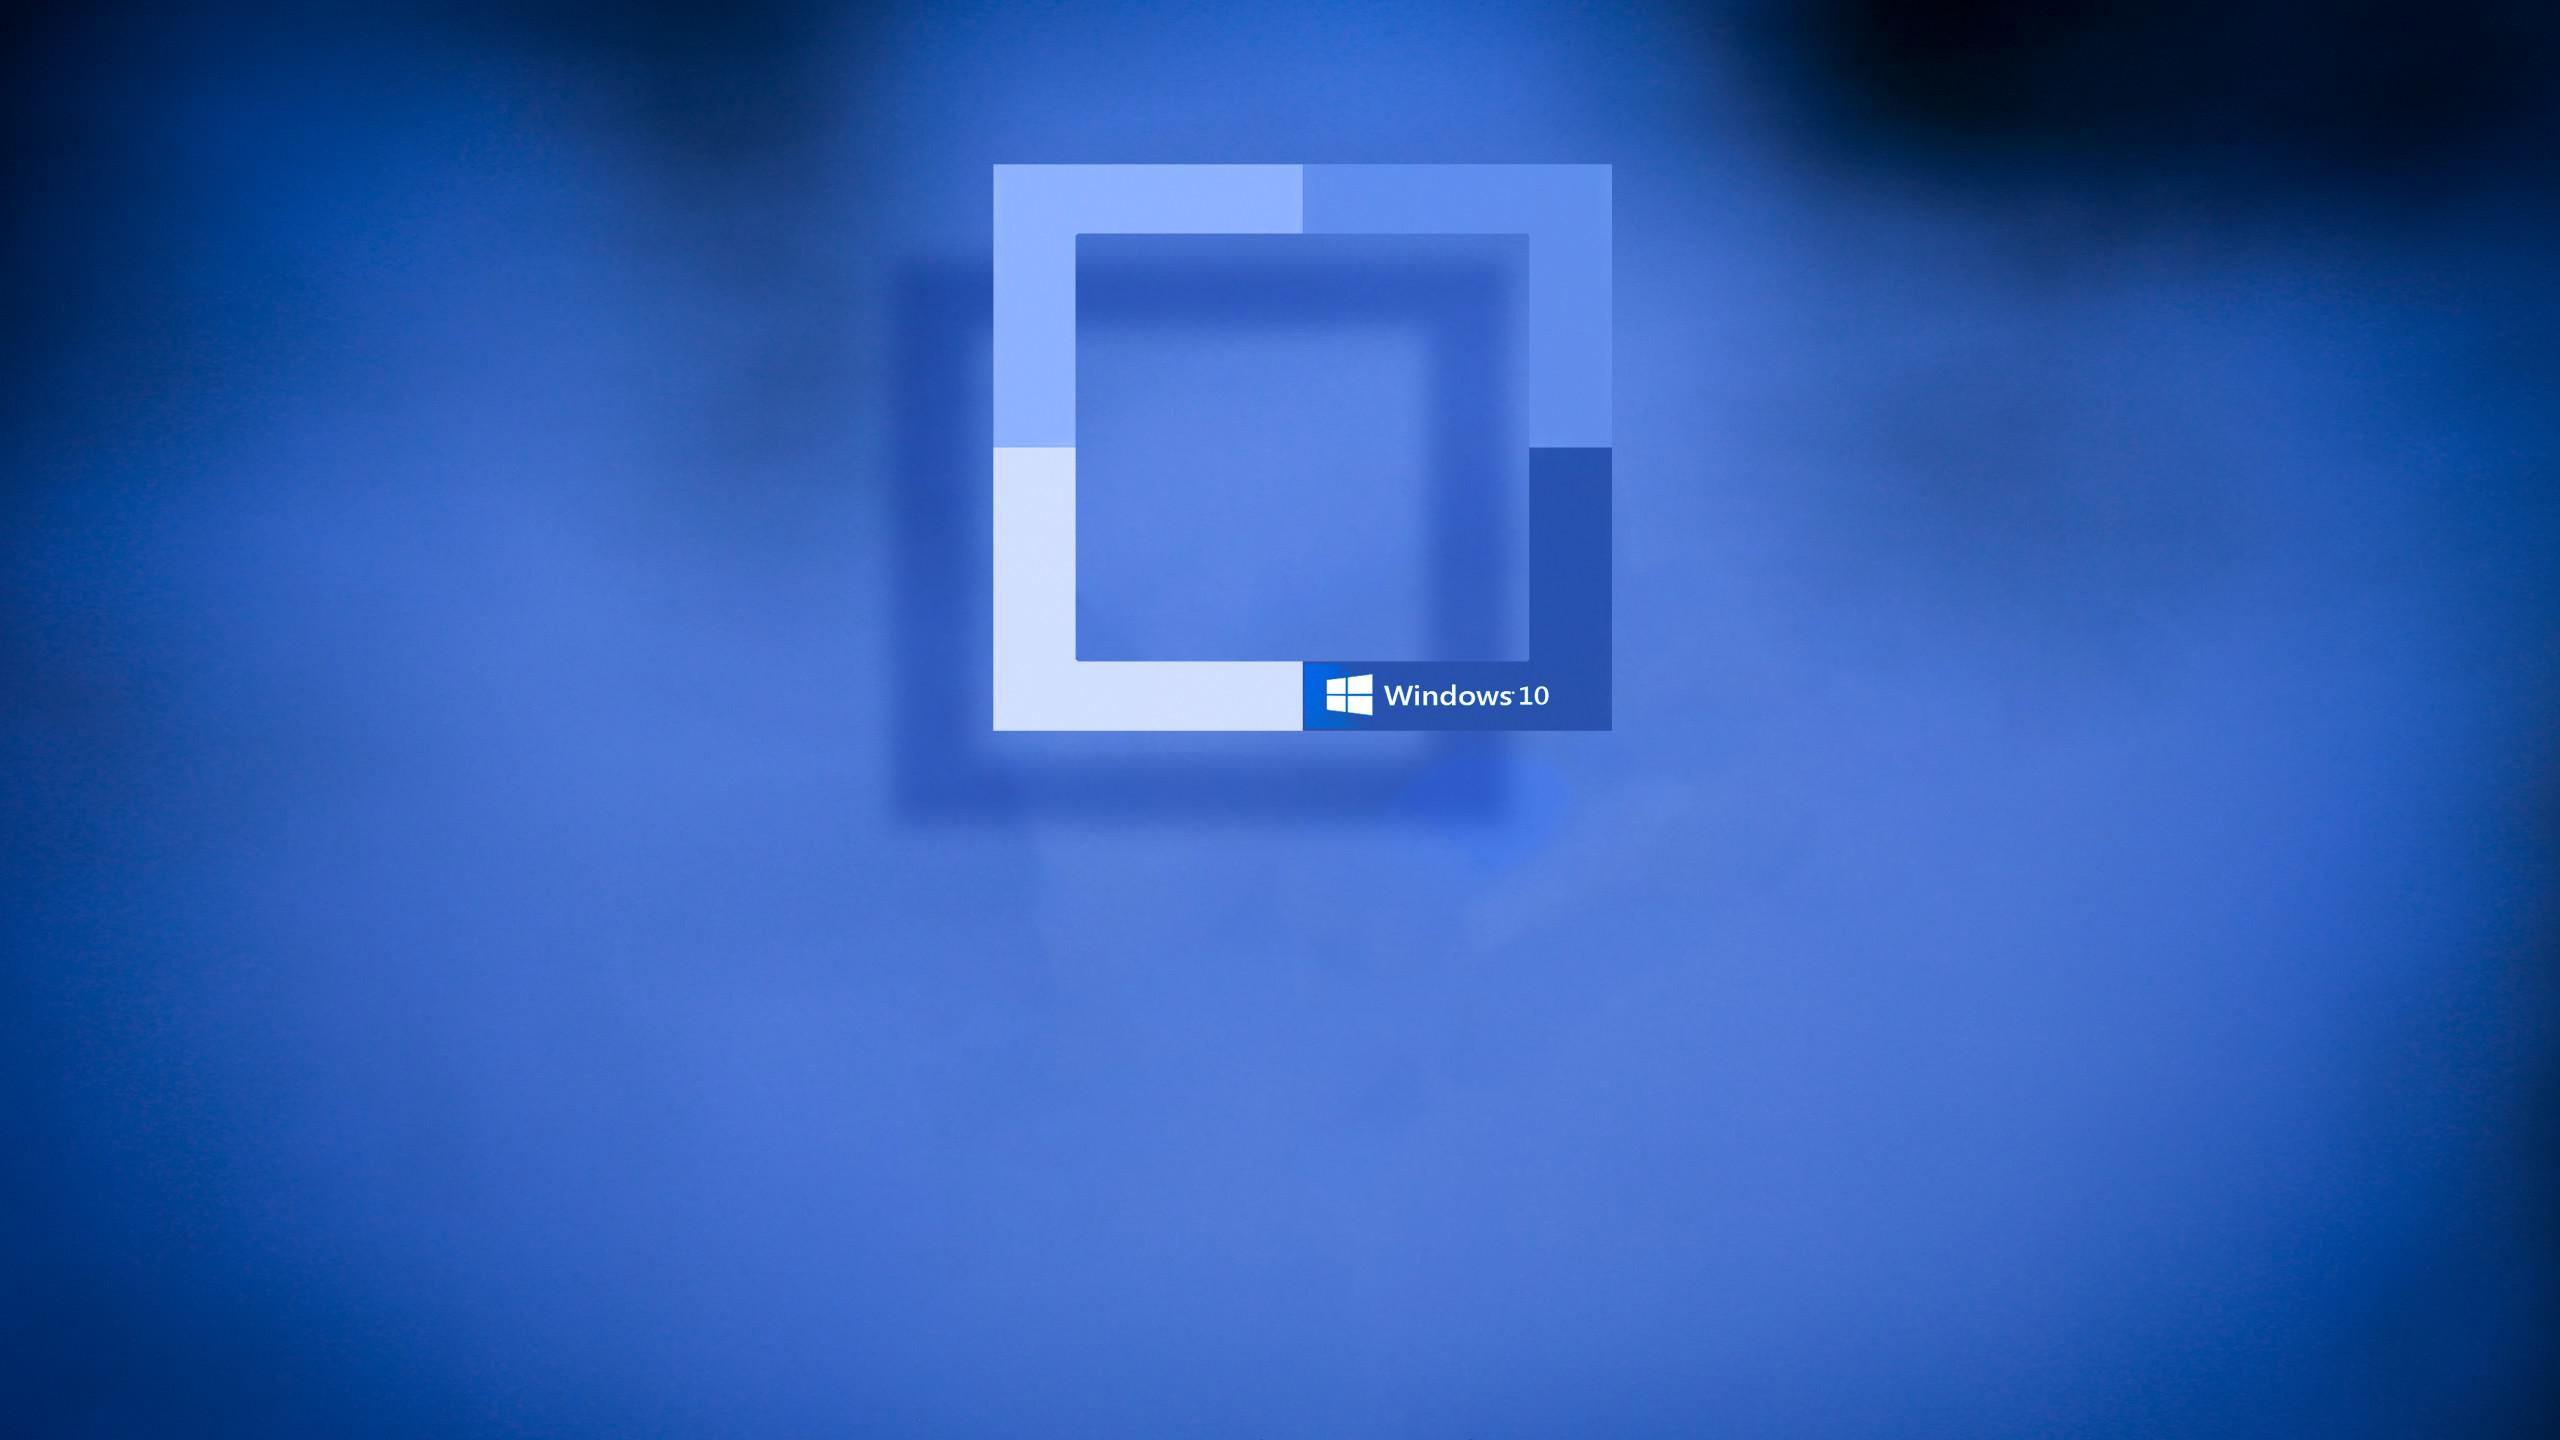 windows 10 logo hd wallpaper (74+ images)